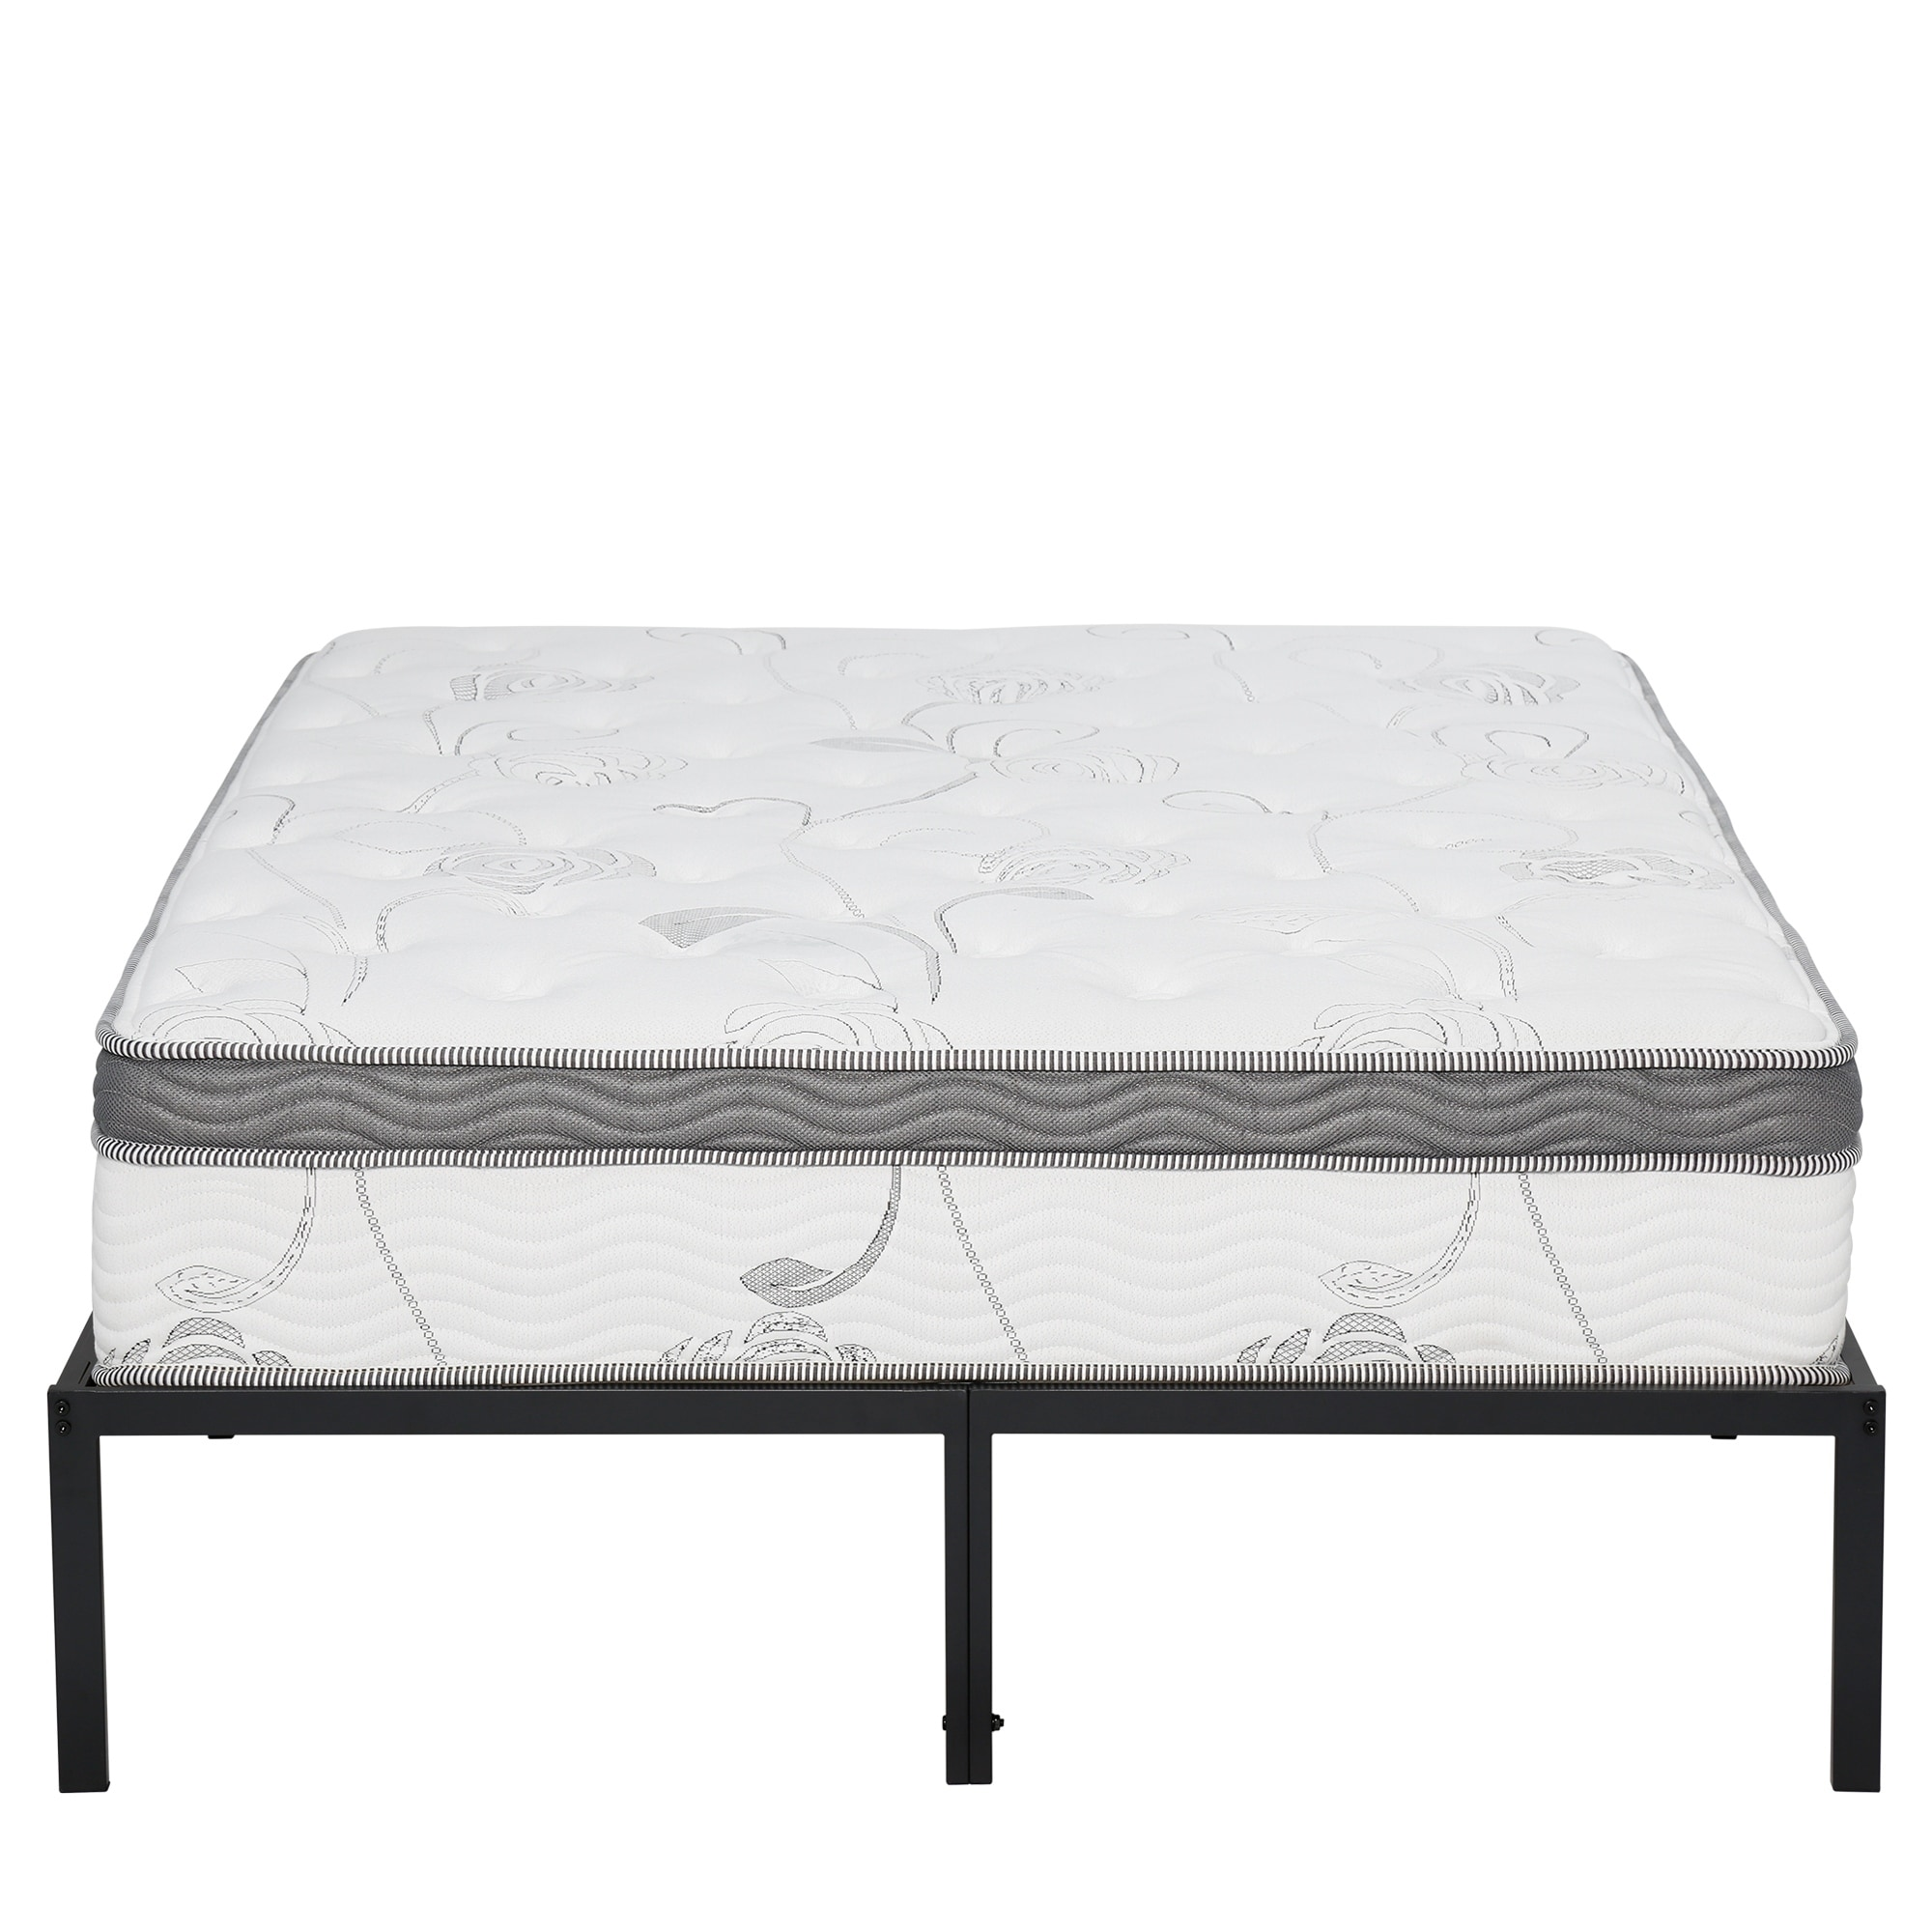 Shop Sleeplanner 14 Inch Platform Easy Assembly Steel Bed Frame with ...